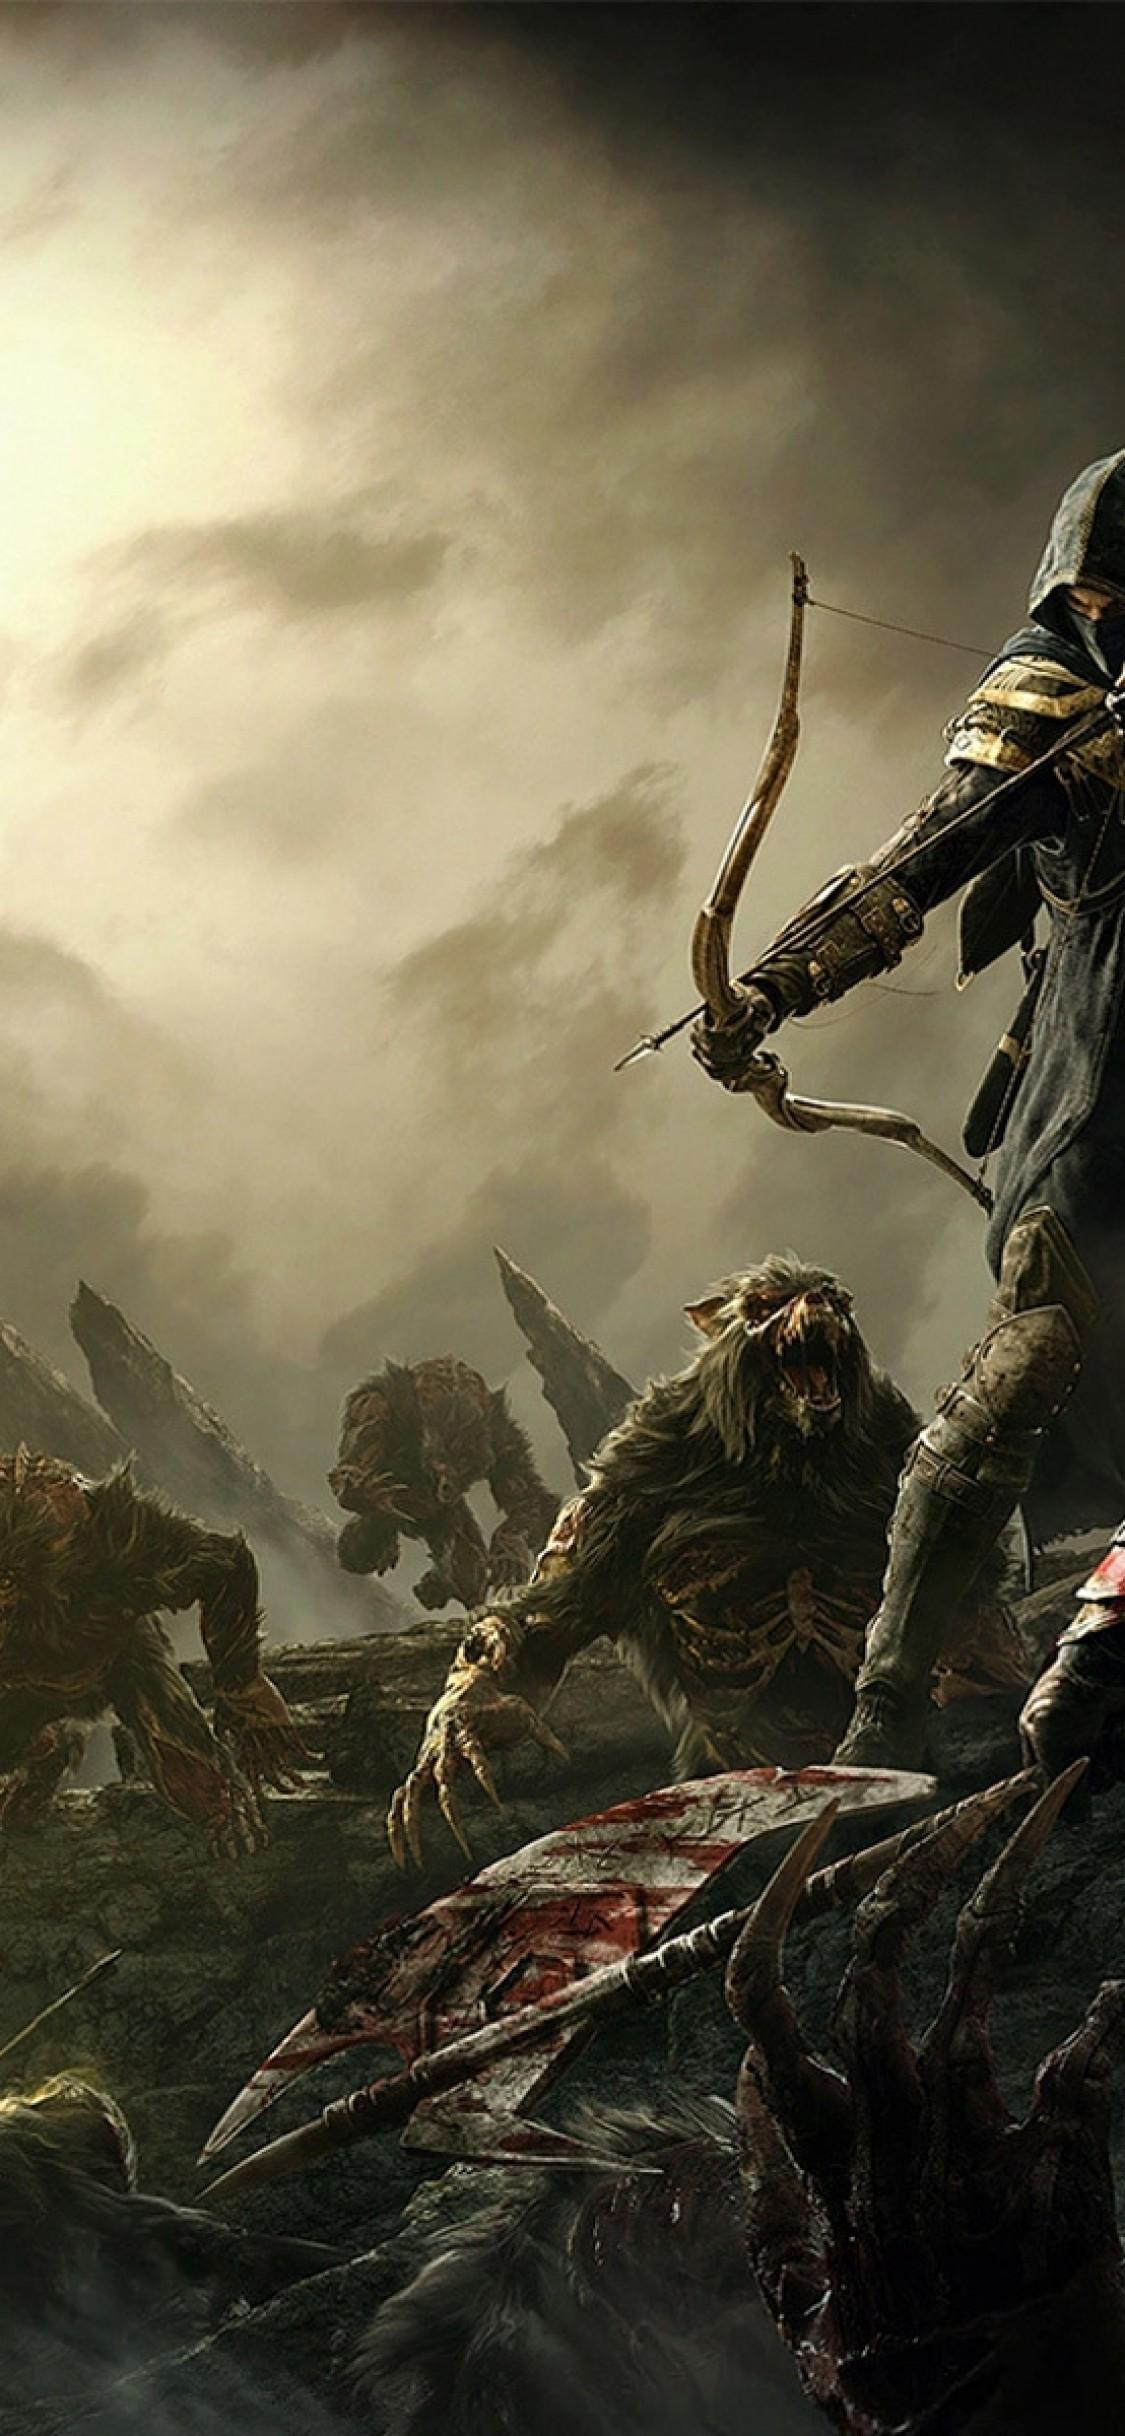 Res: 1125x2436, Elder Scrolls V: Skyrim, Archer, Warrior, Battle, Fantasy, Artwork